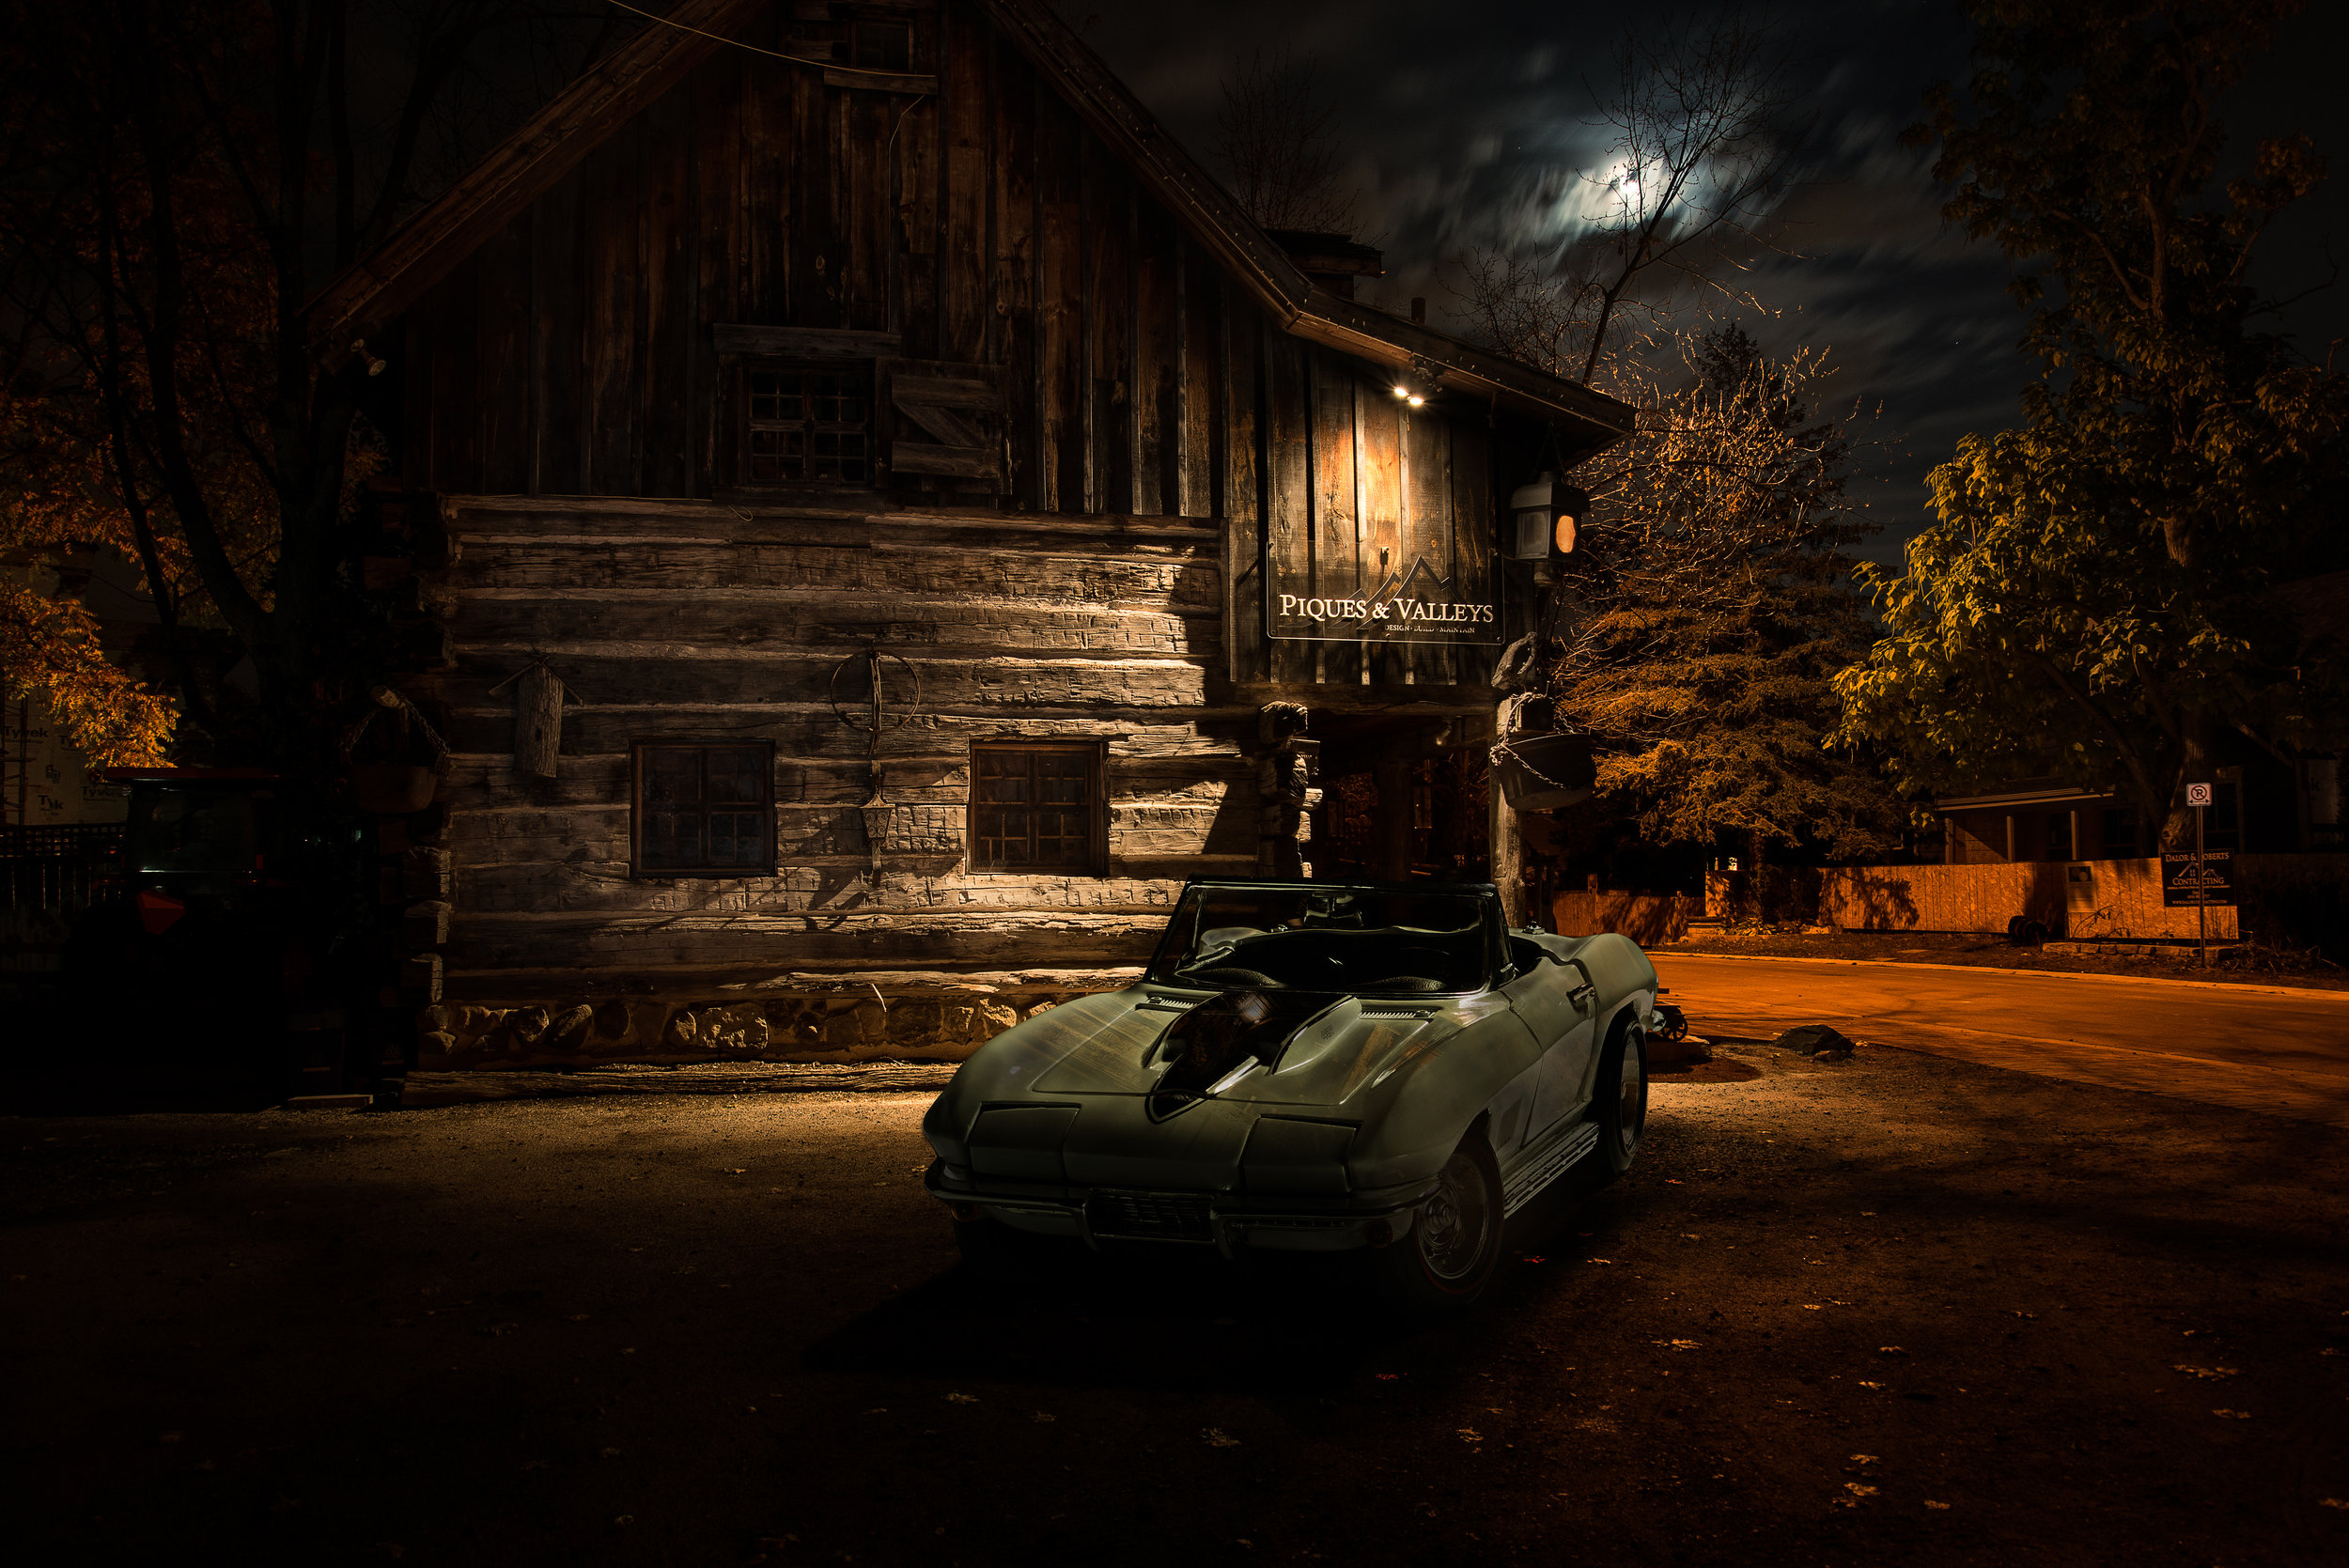 Toy Car (2 photo composite)